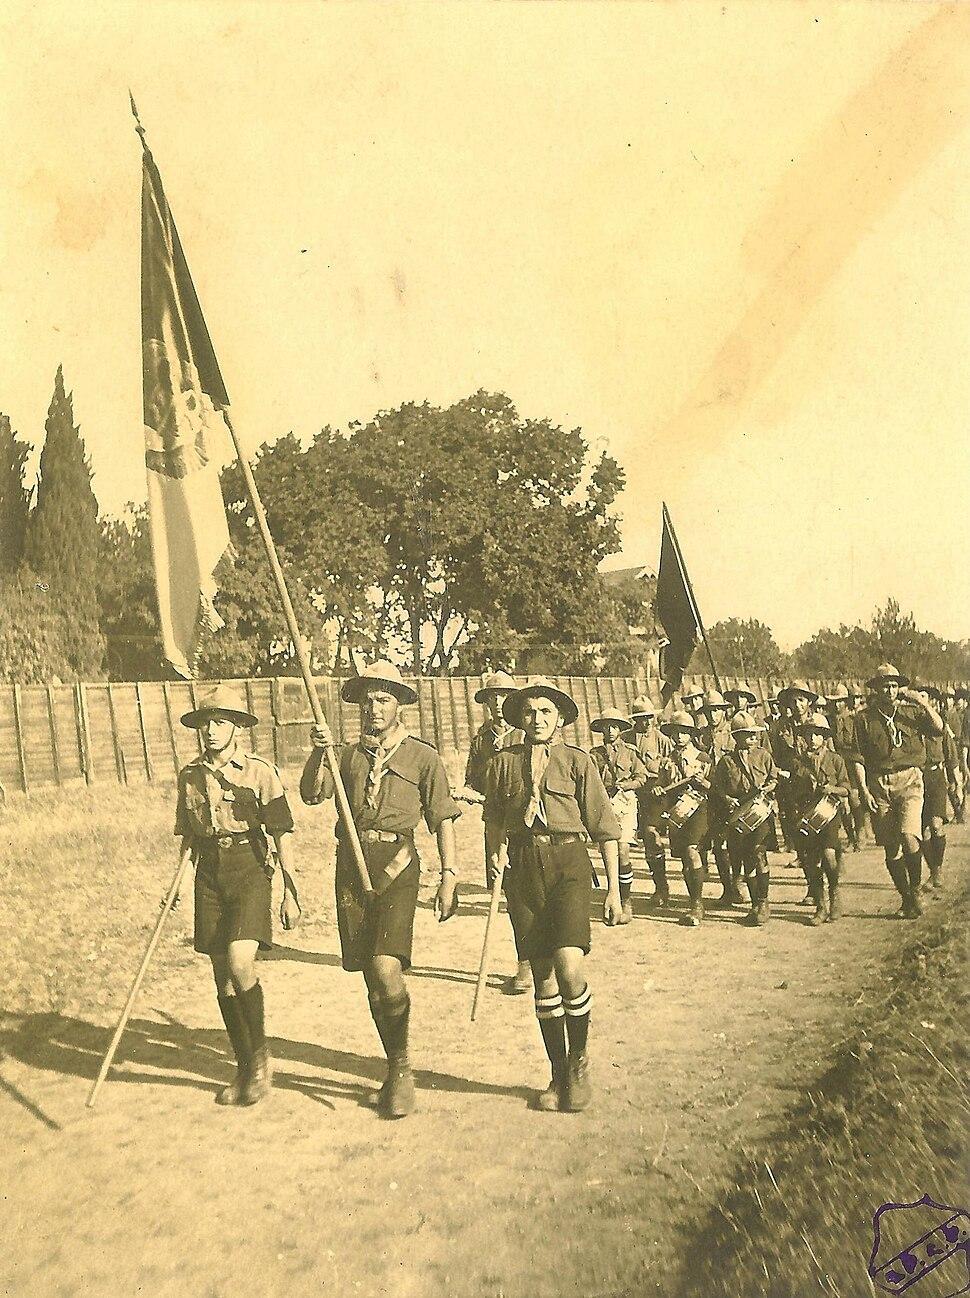 Vazken Andréassian HoMenEtMen-Sgaoudagan doghantsk Konstantinobolis 1918